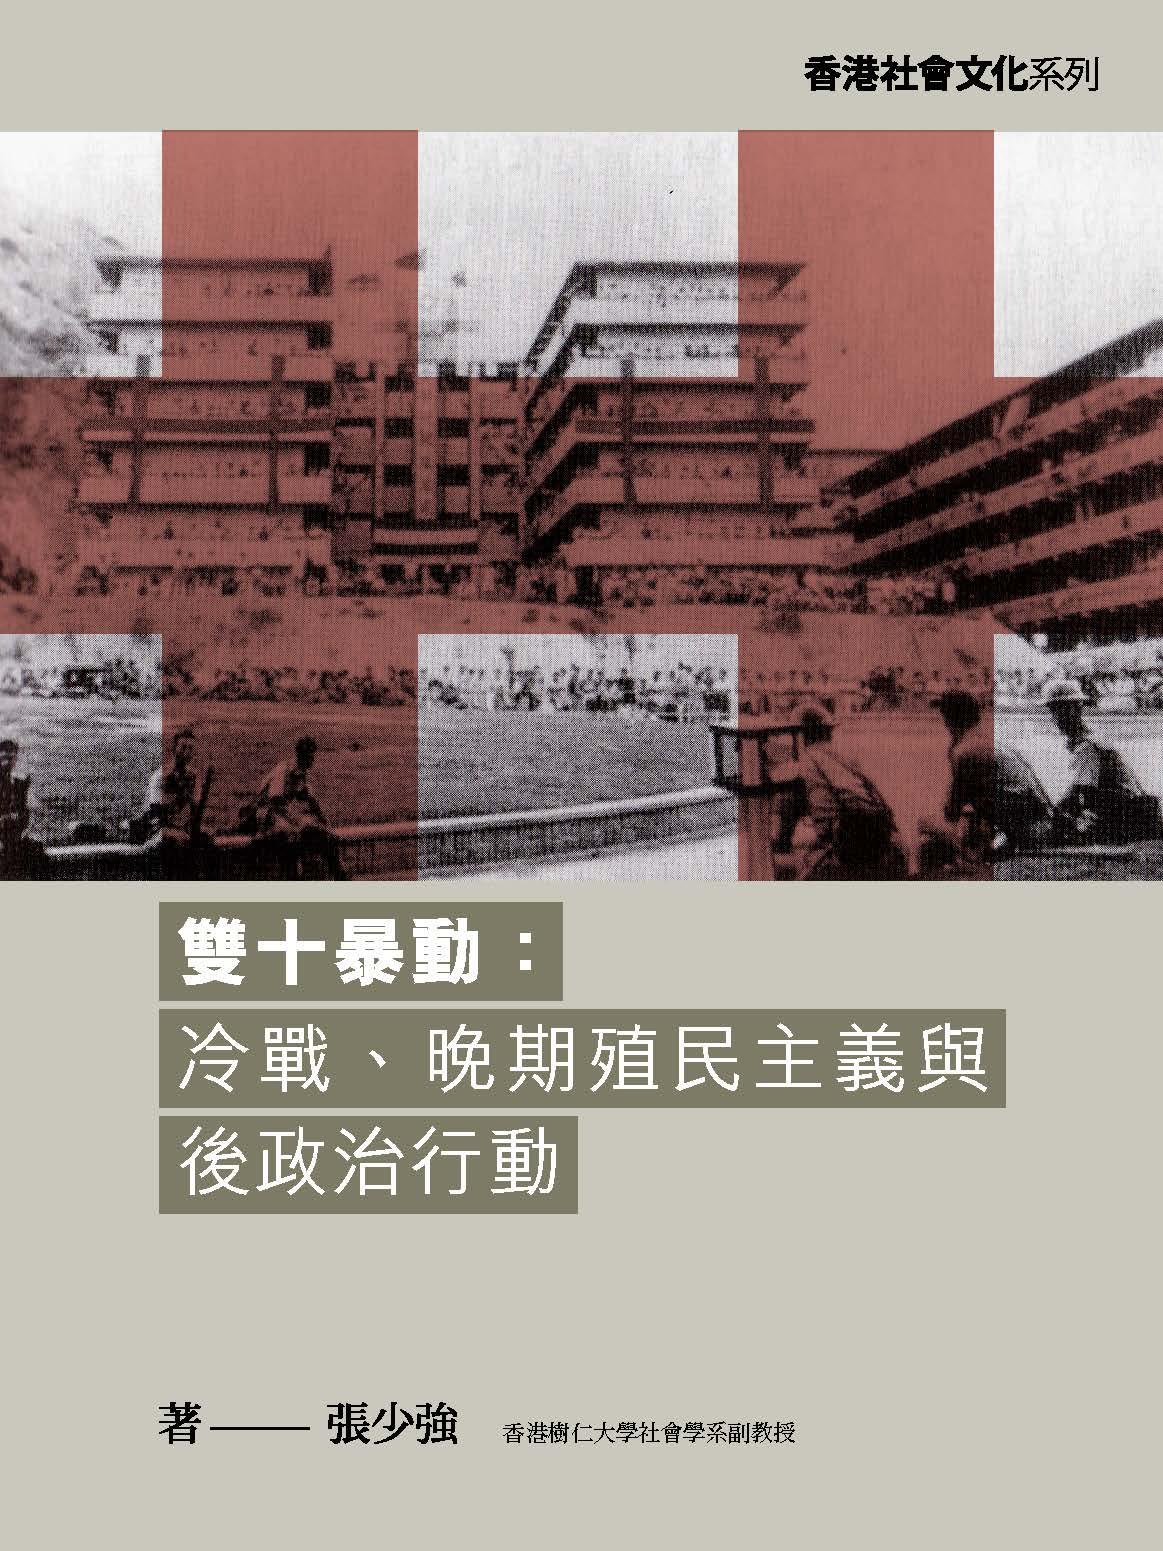 HKSCS-020-csk